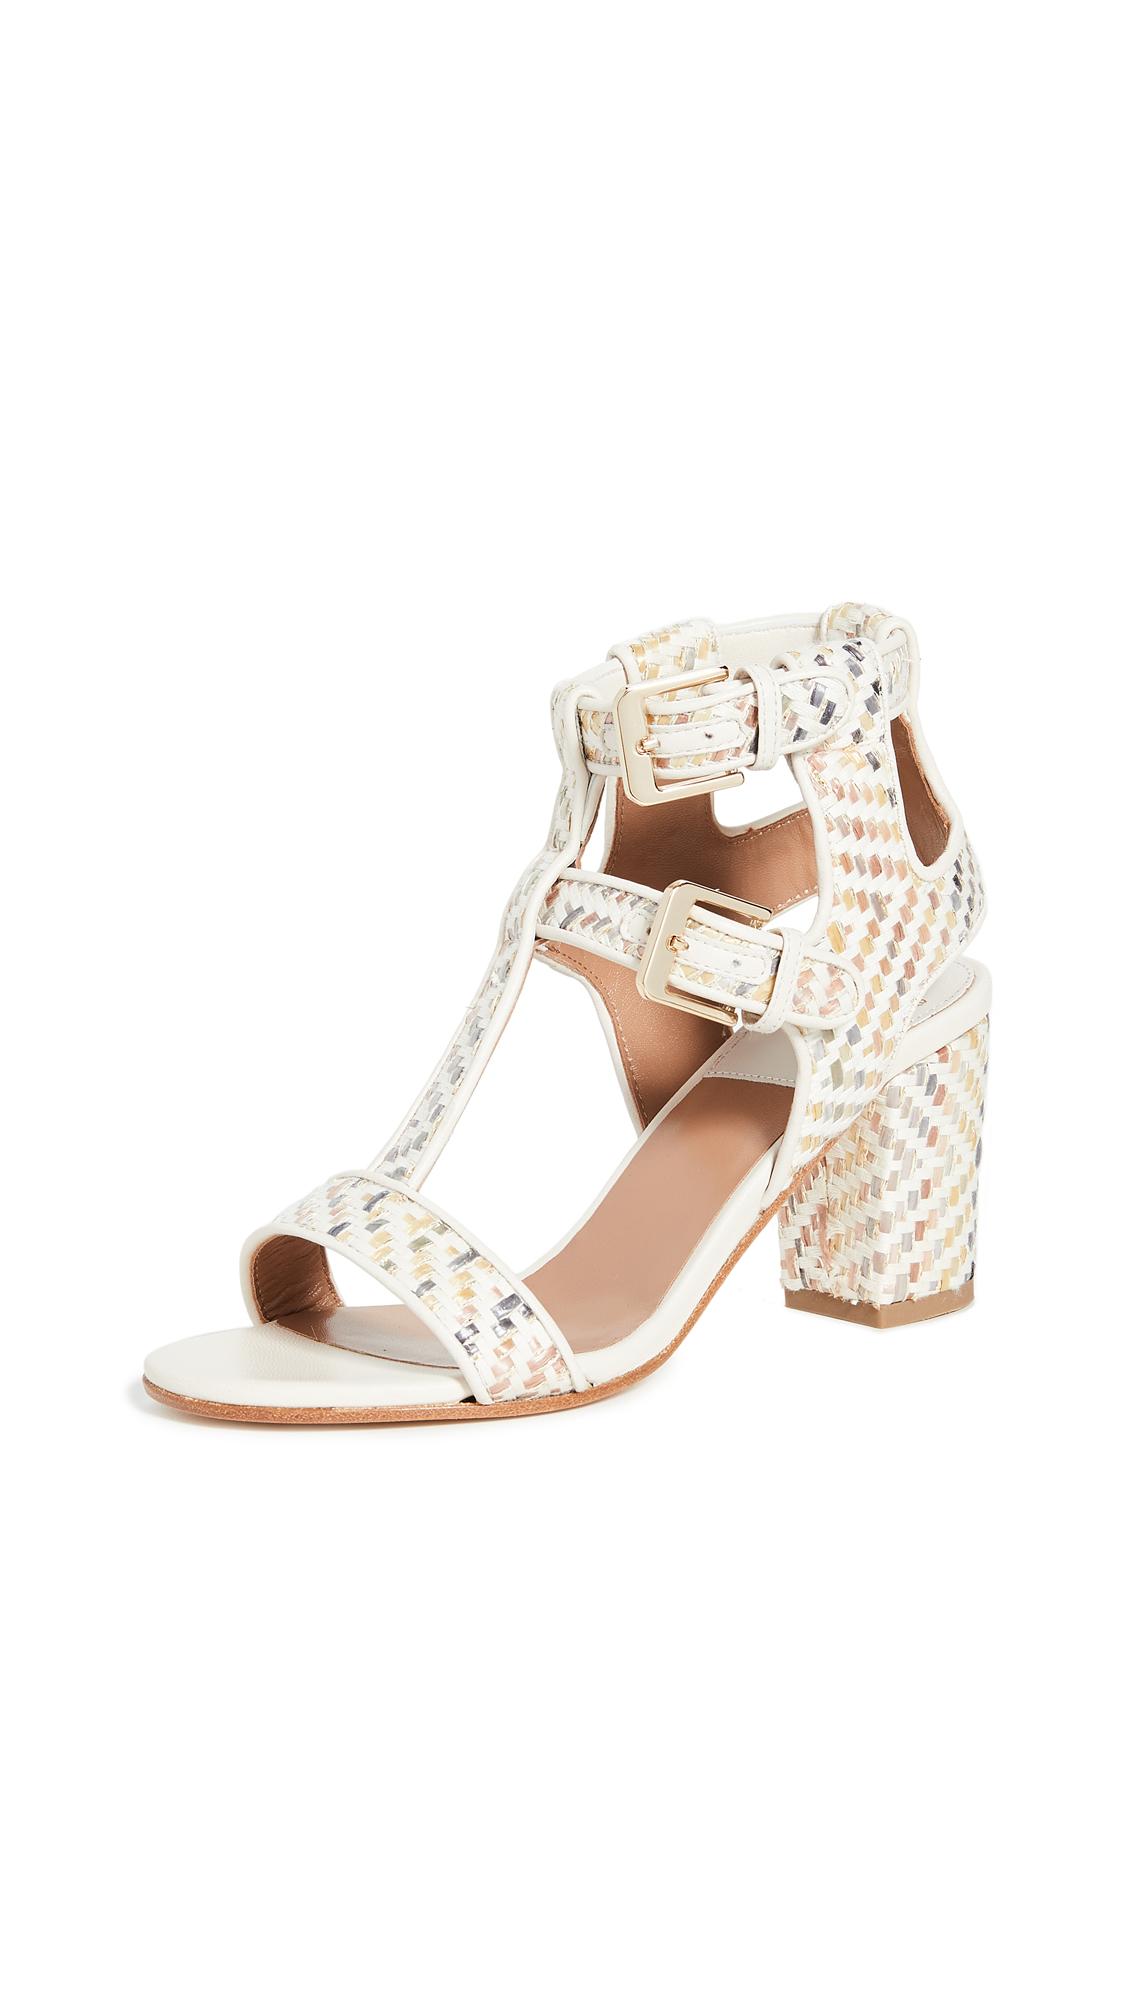 Laurence Dacade Helie Sandals - 50% Off Sale